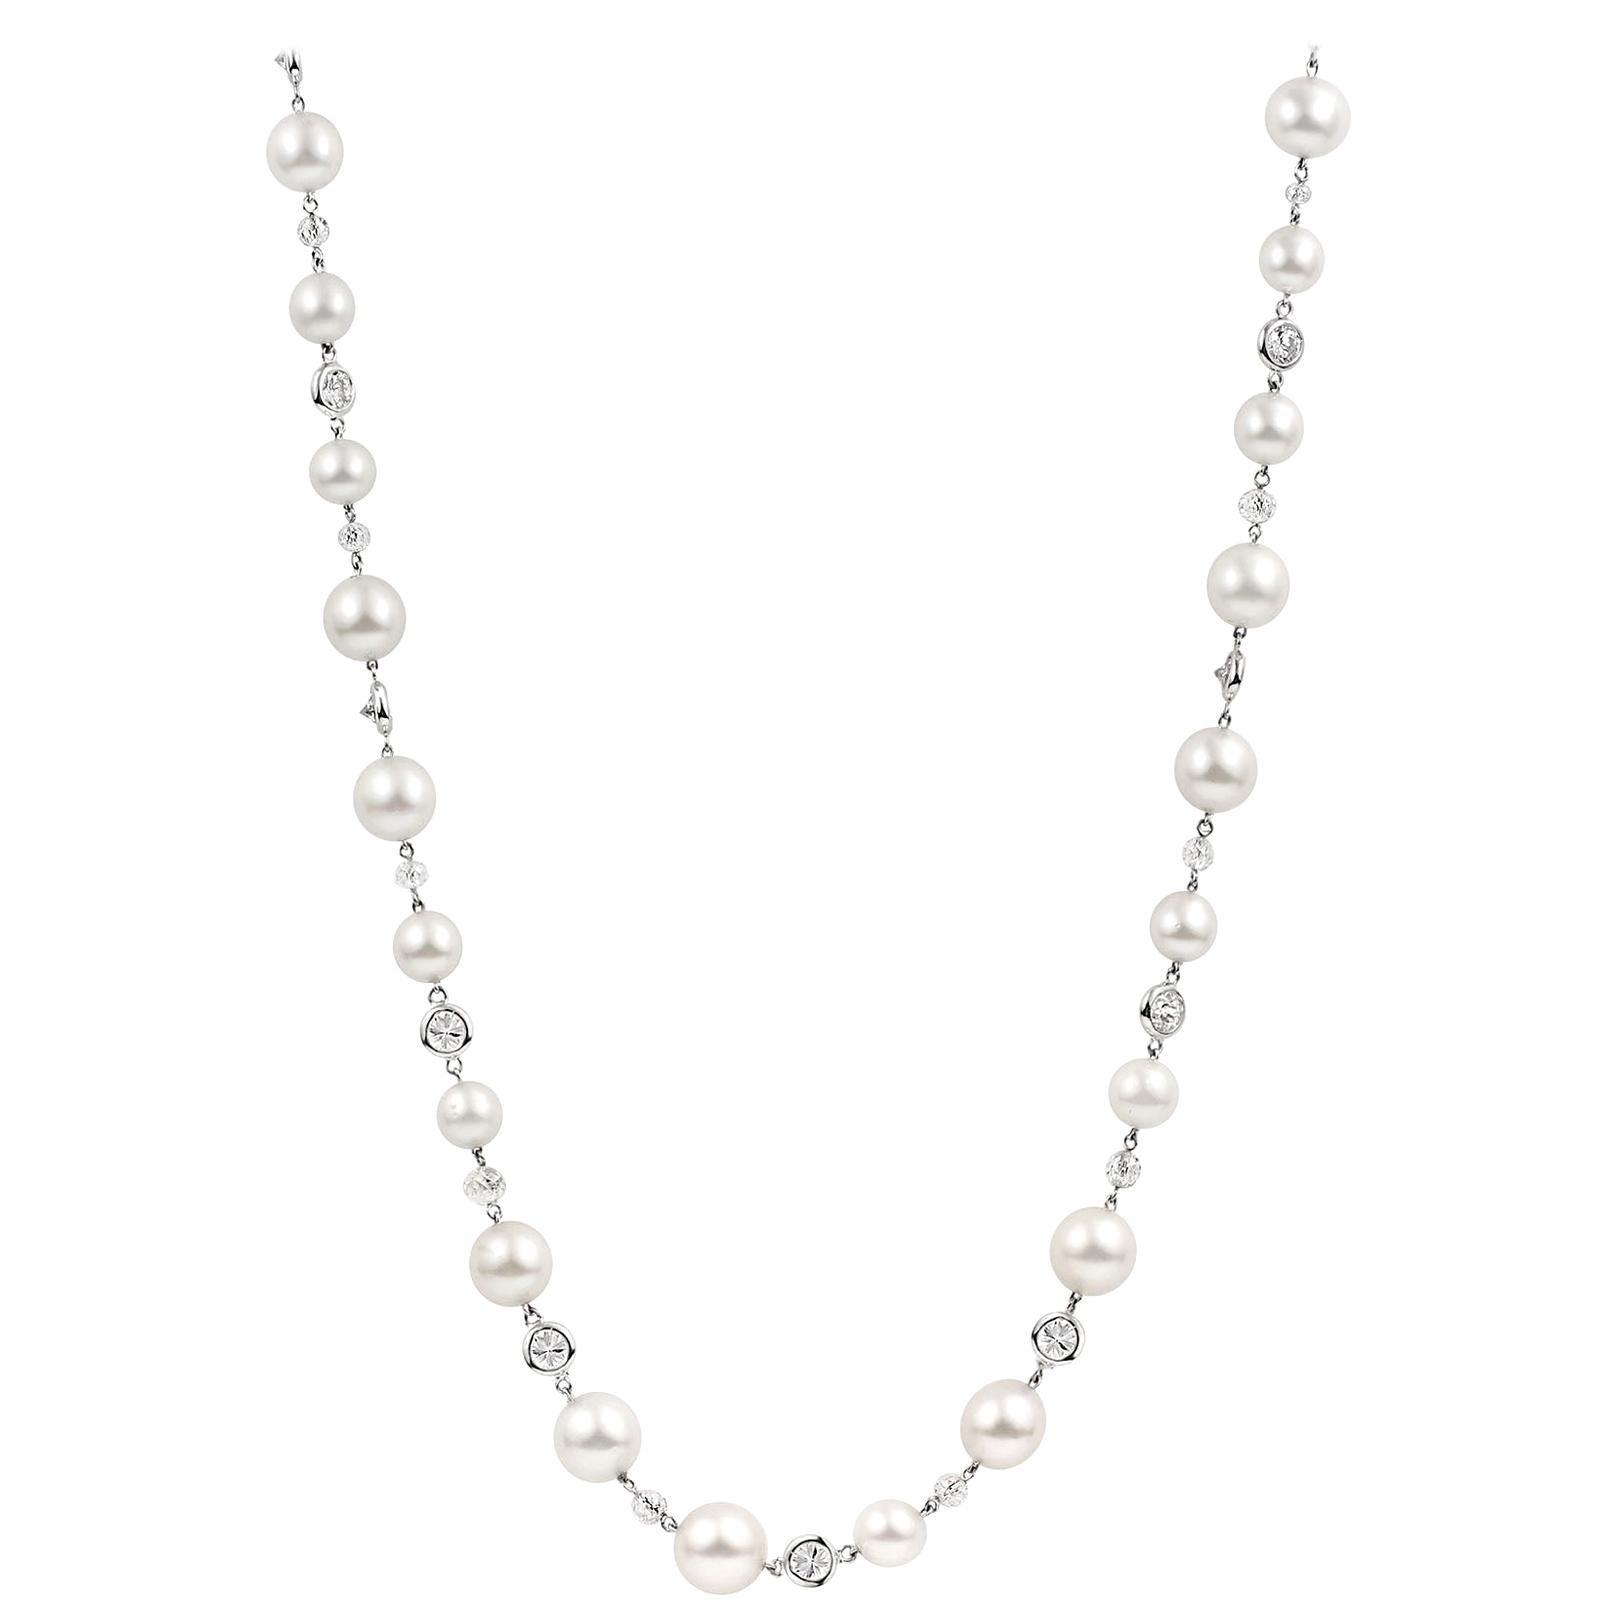 Julius Cohen Pearl and Diamond Necklace